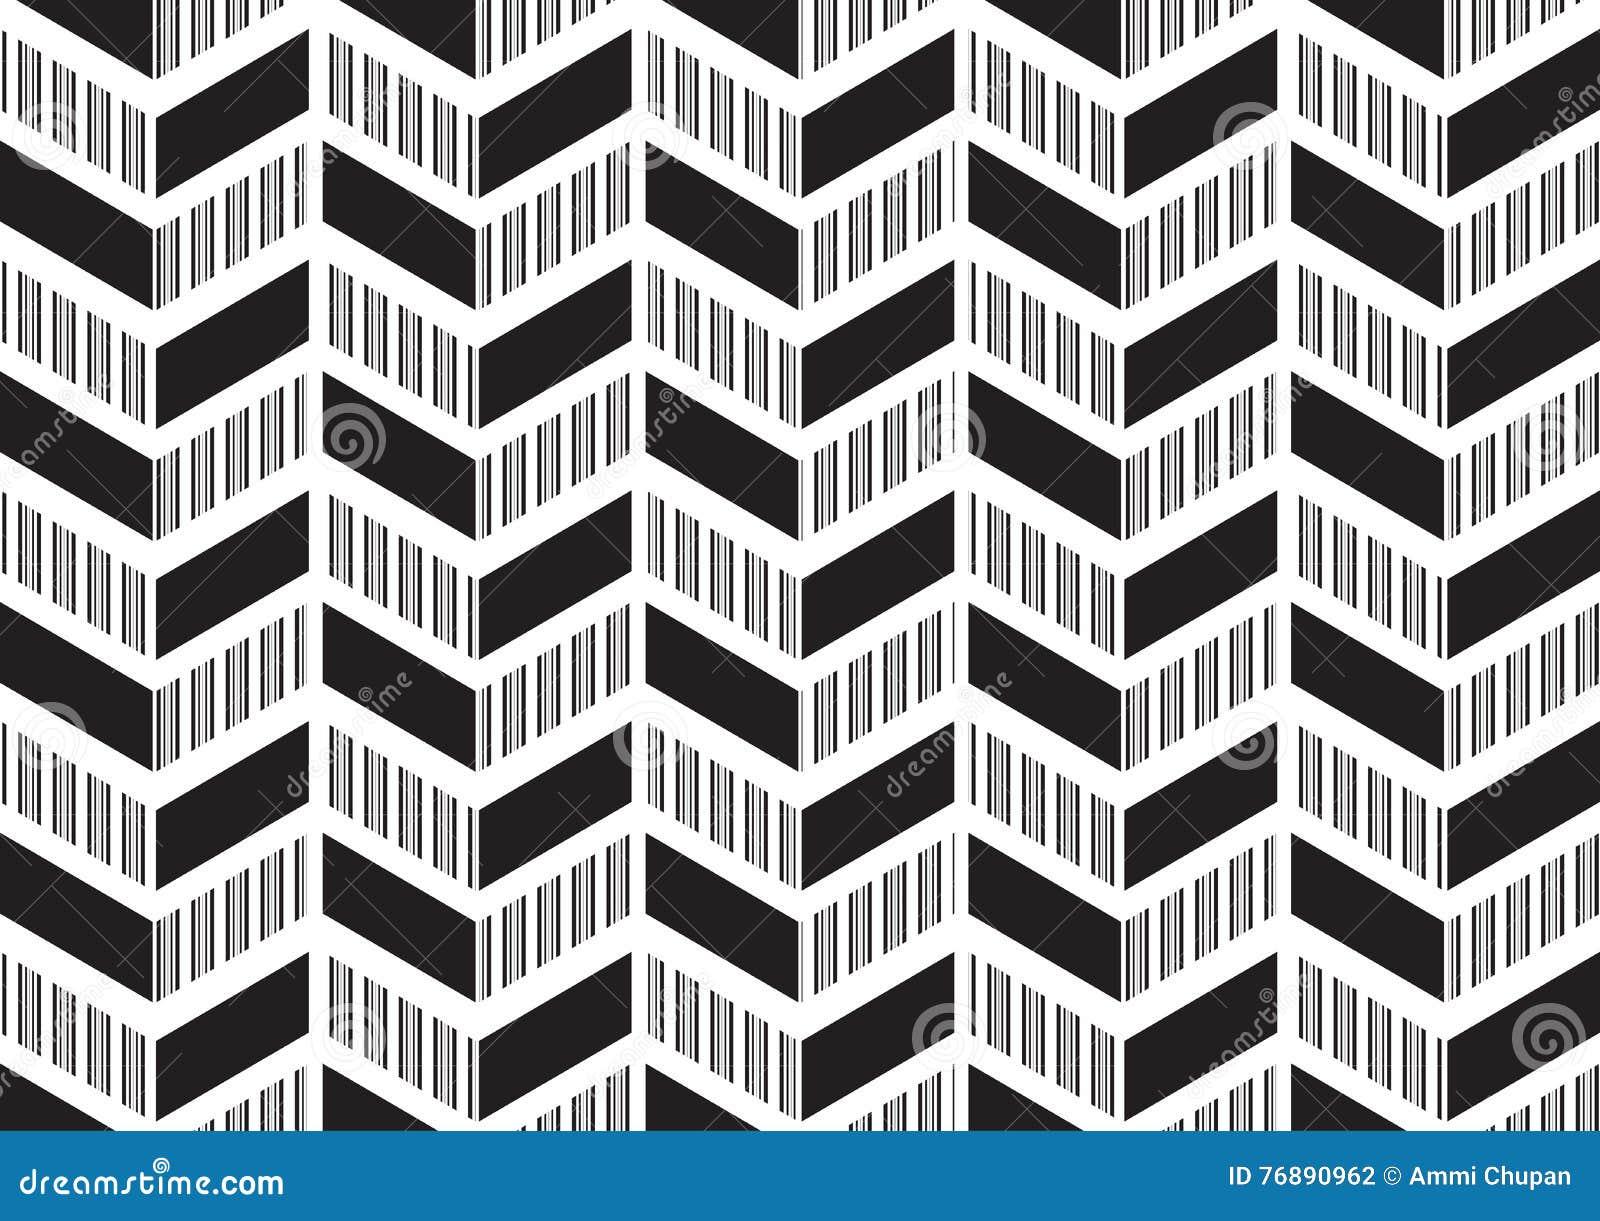 Abstract corner modern design pattern background in black white colour theme